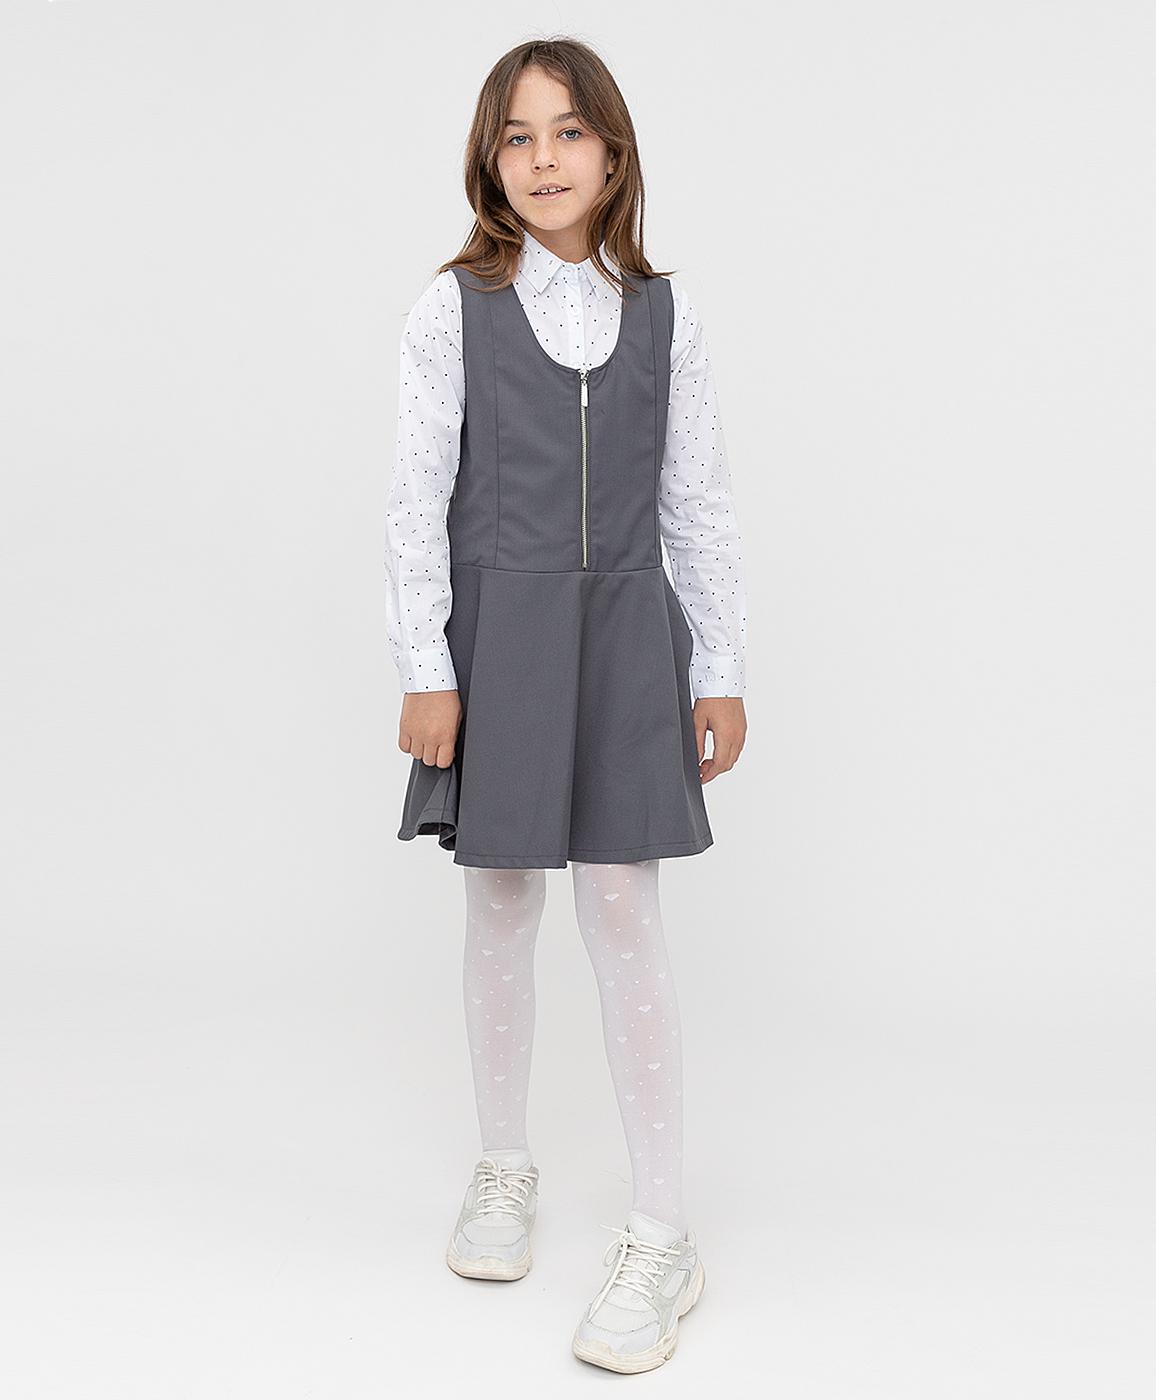 Купить 221BBGS25010100, Сарафан серый Button Blue, 146, Полиэстер, Женский, ШКОЛЬНАЯ ФОРМА 2021-2022 (shop: GulliverMarket Gulliver Market)